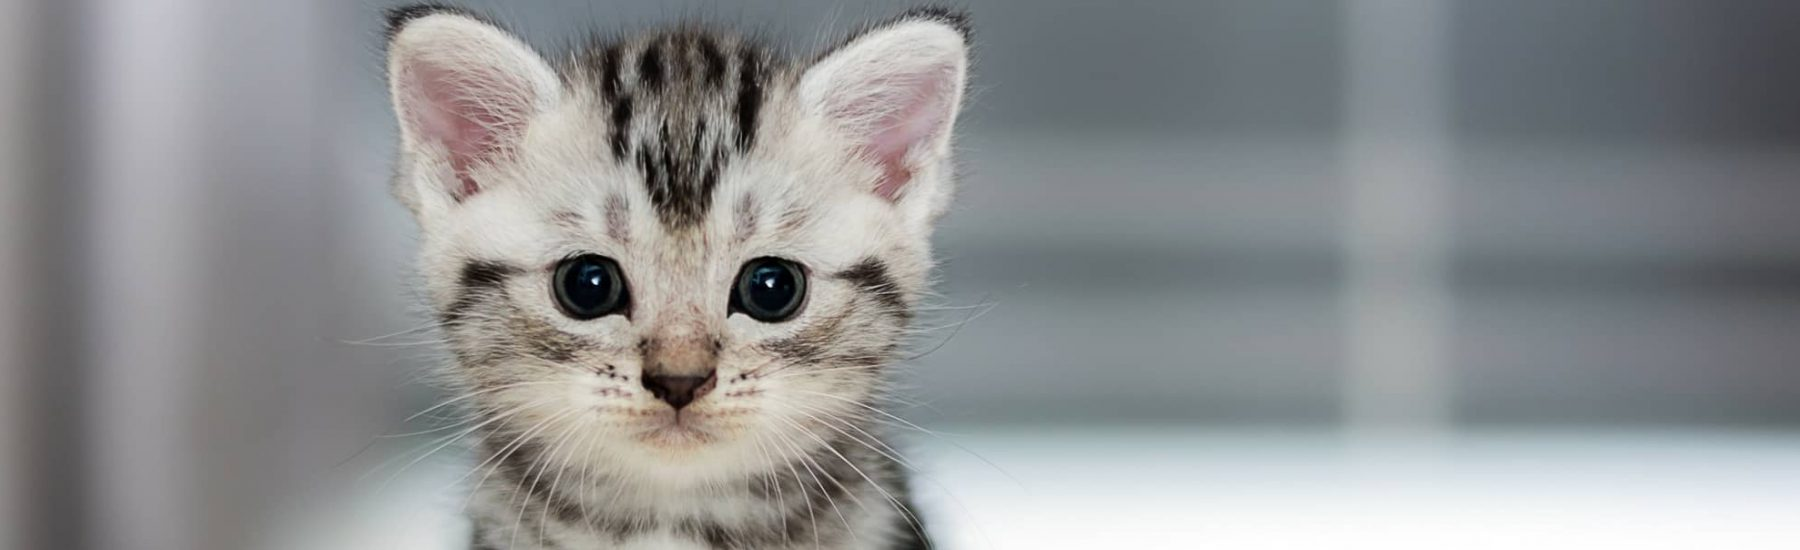 cat_general